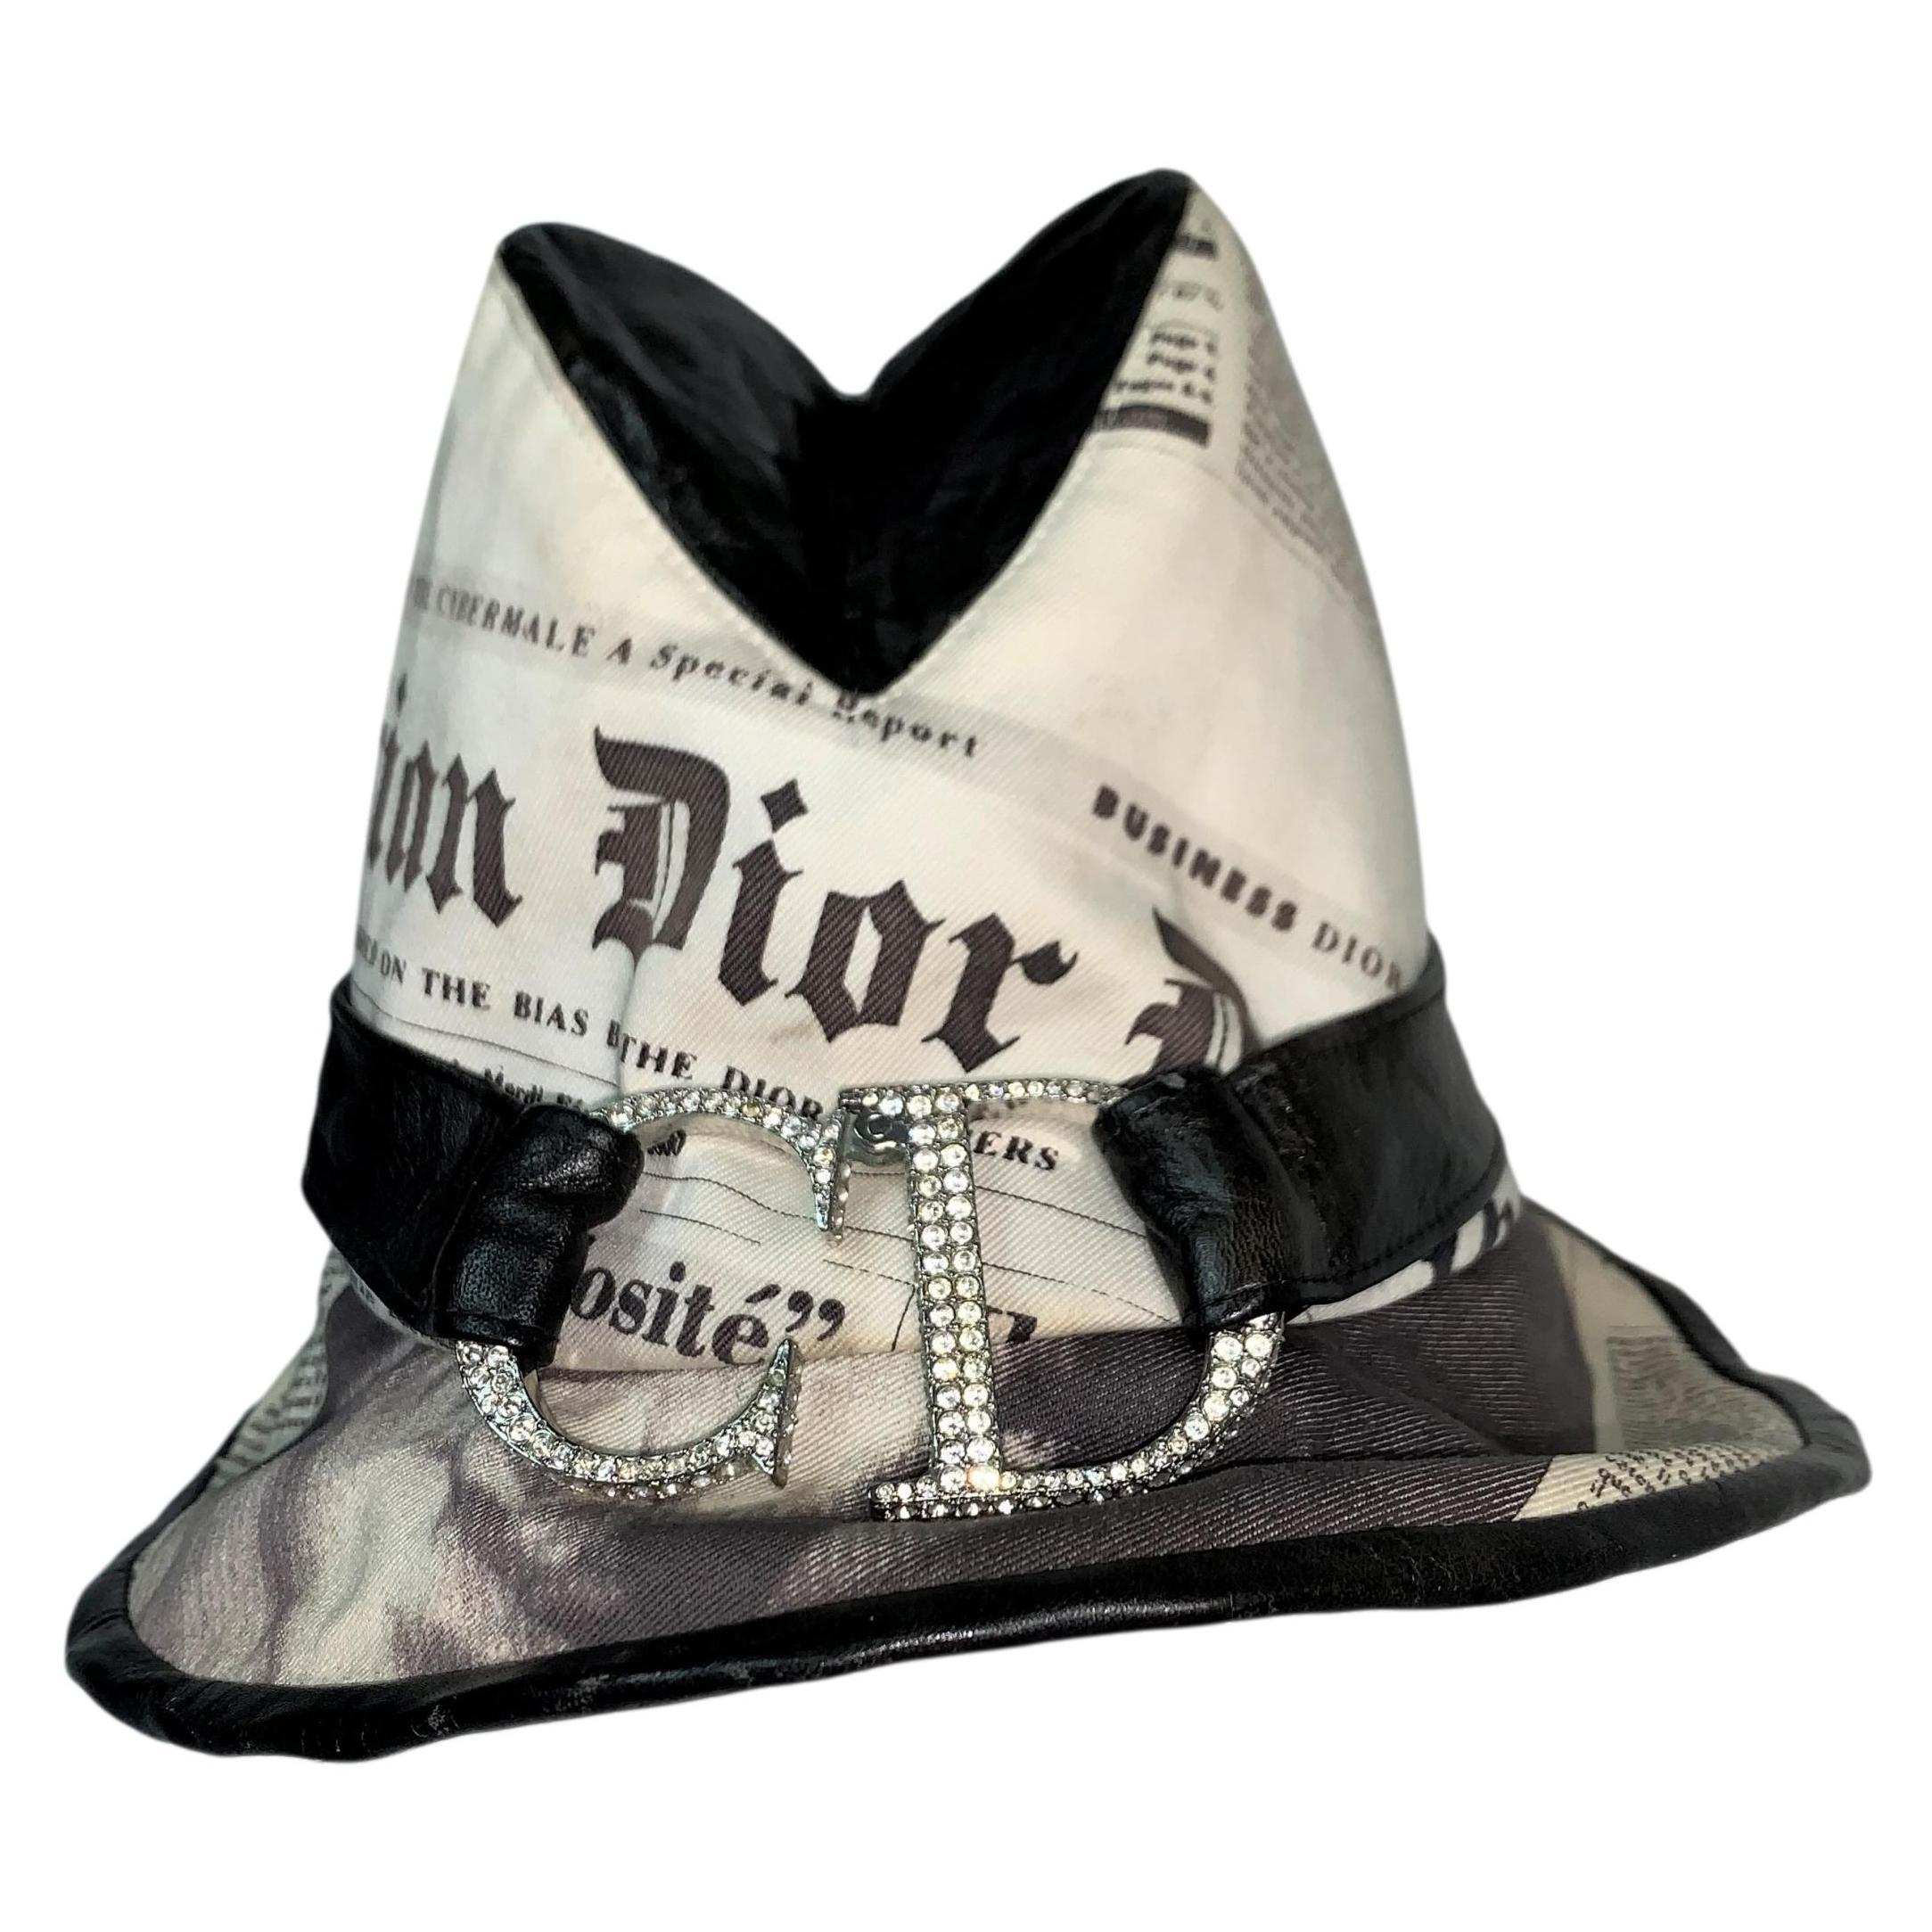 F/W 2000 Christian Dior John Galliano Newsprint Logo by Stephen Jones Top Hat